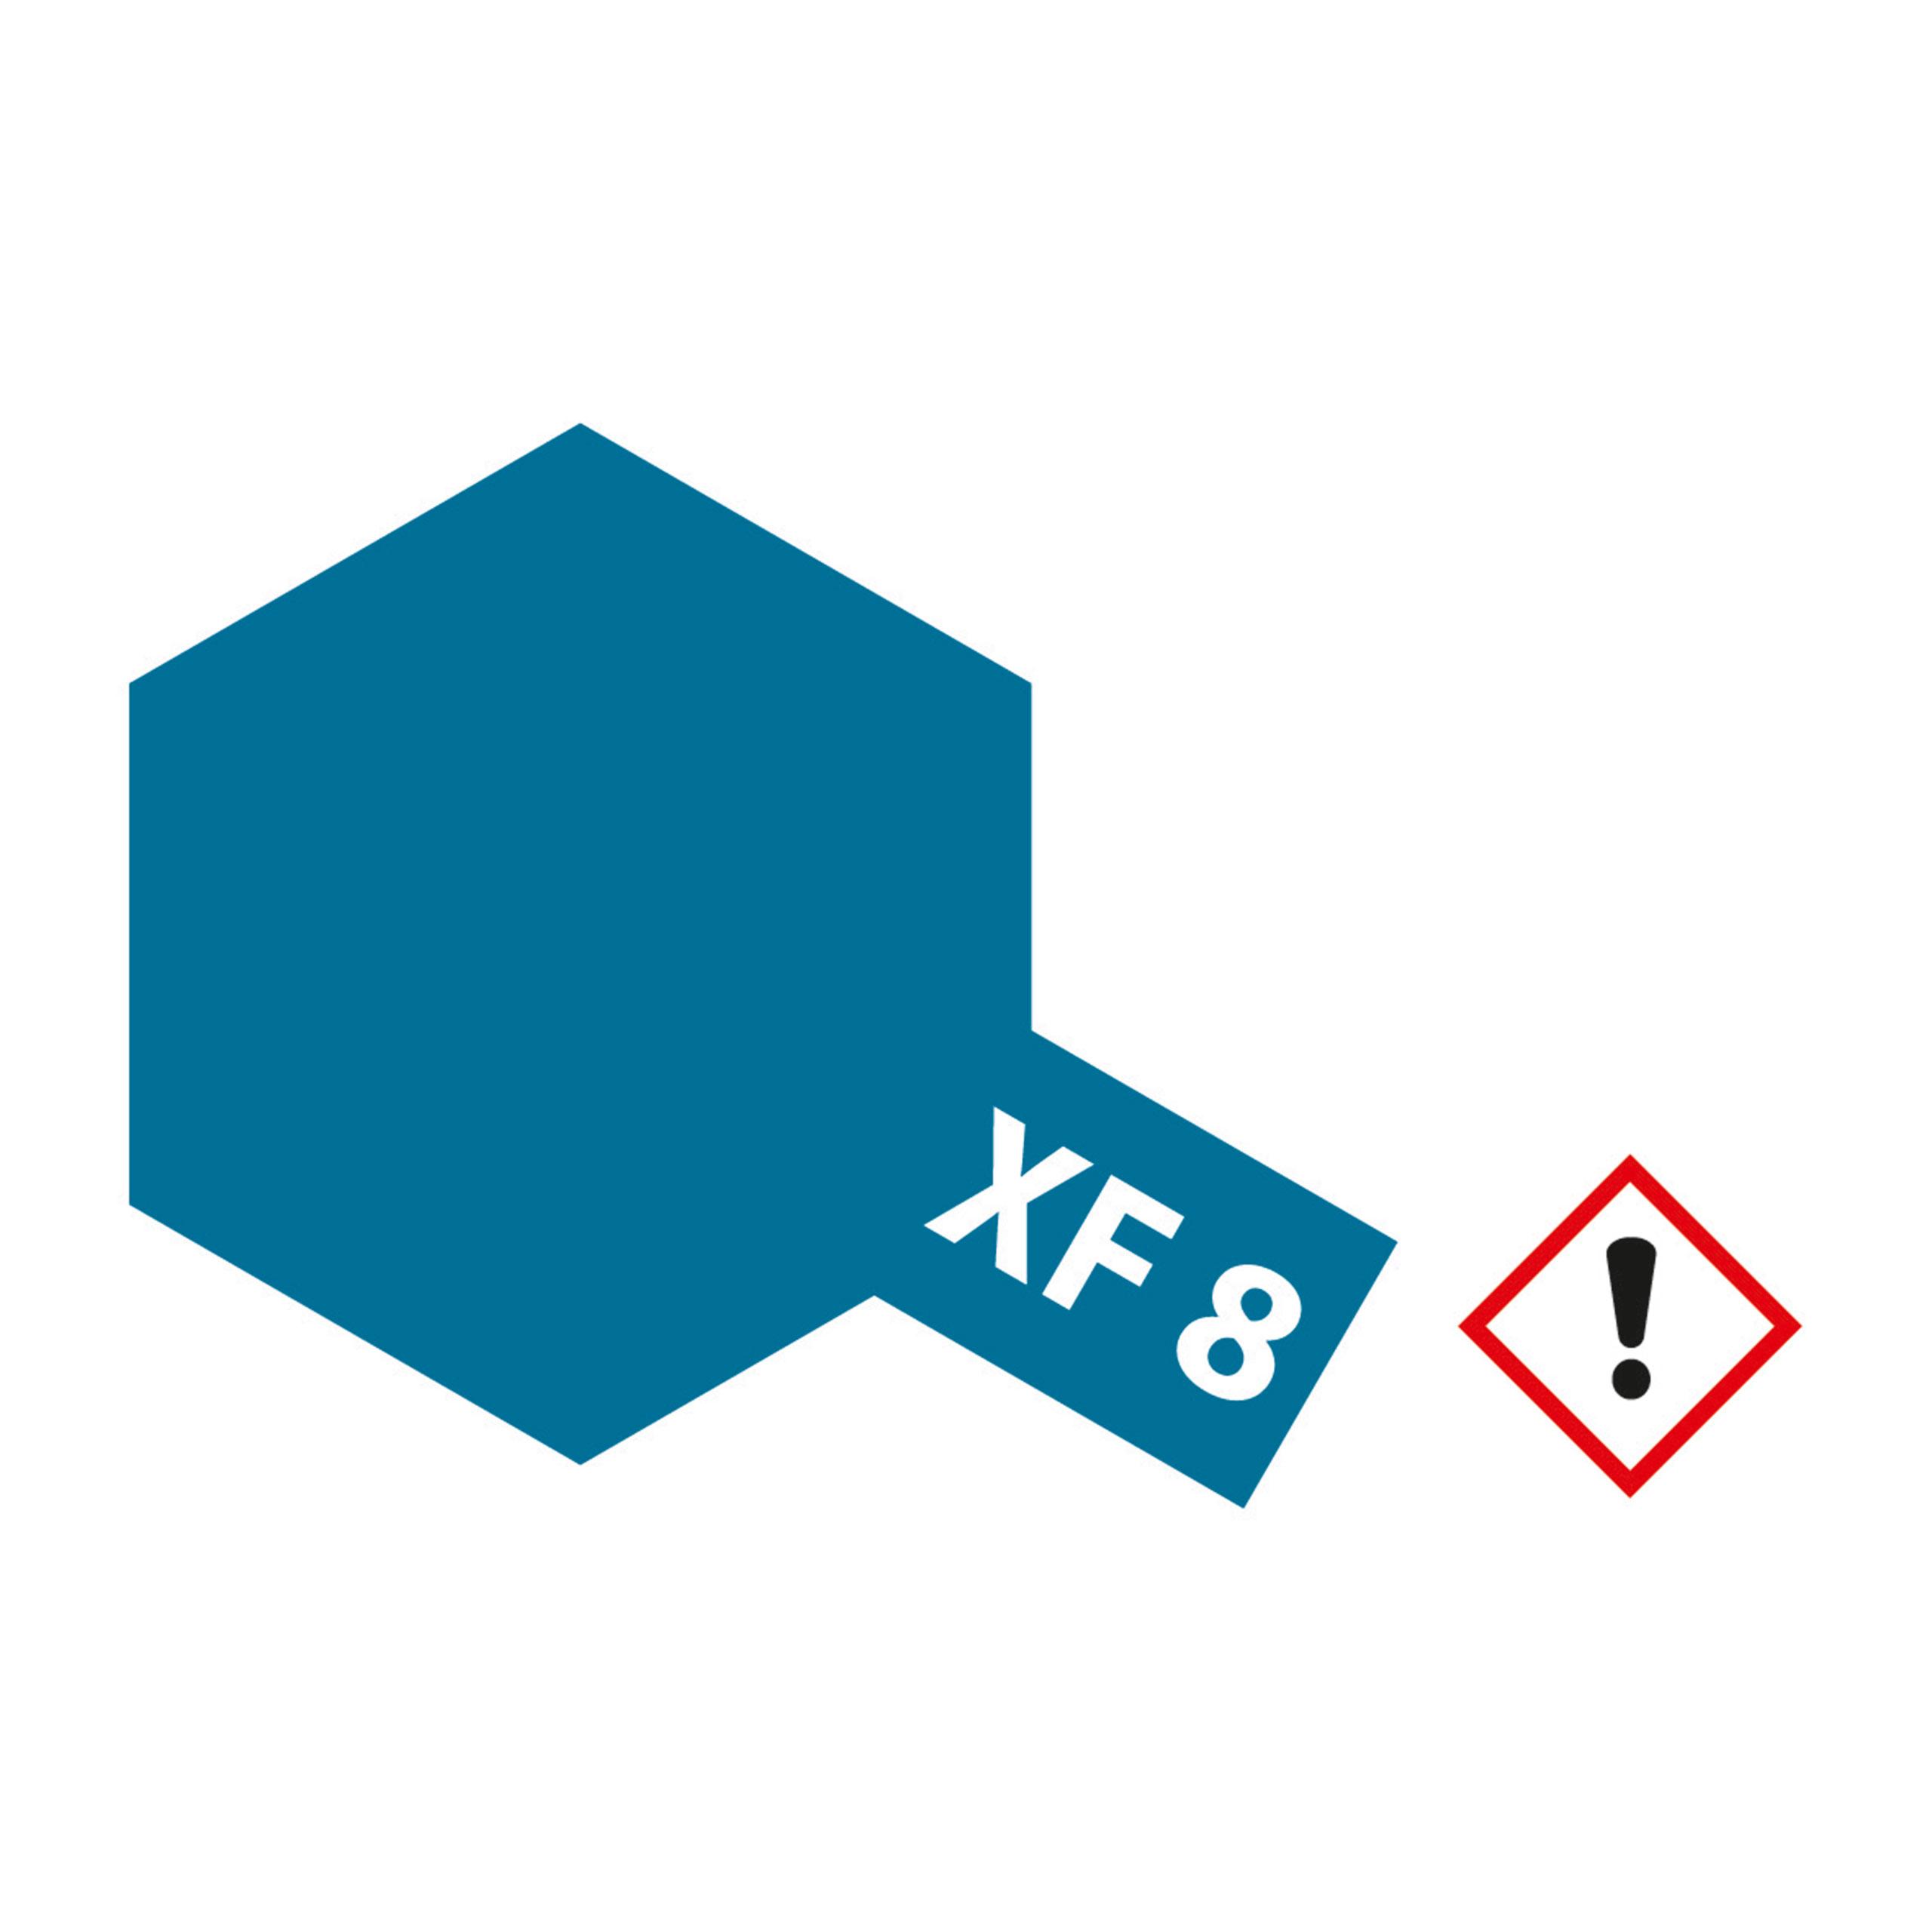 XF-8 Blau matt - 23ml Acrylstreichfarbe wasserloeslich Tamiya 300081308